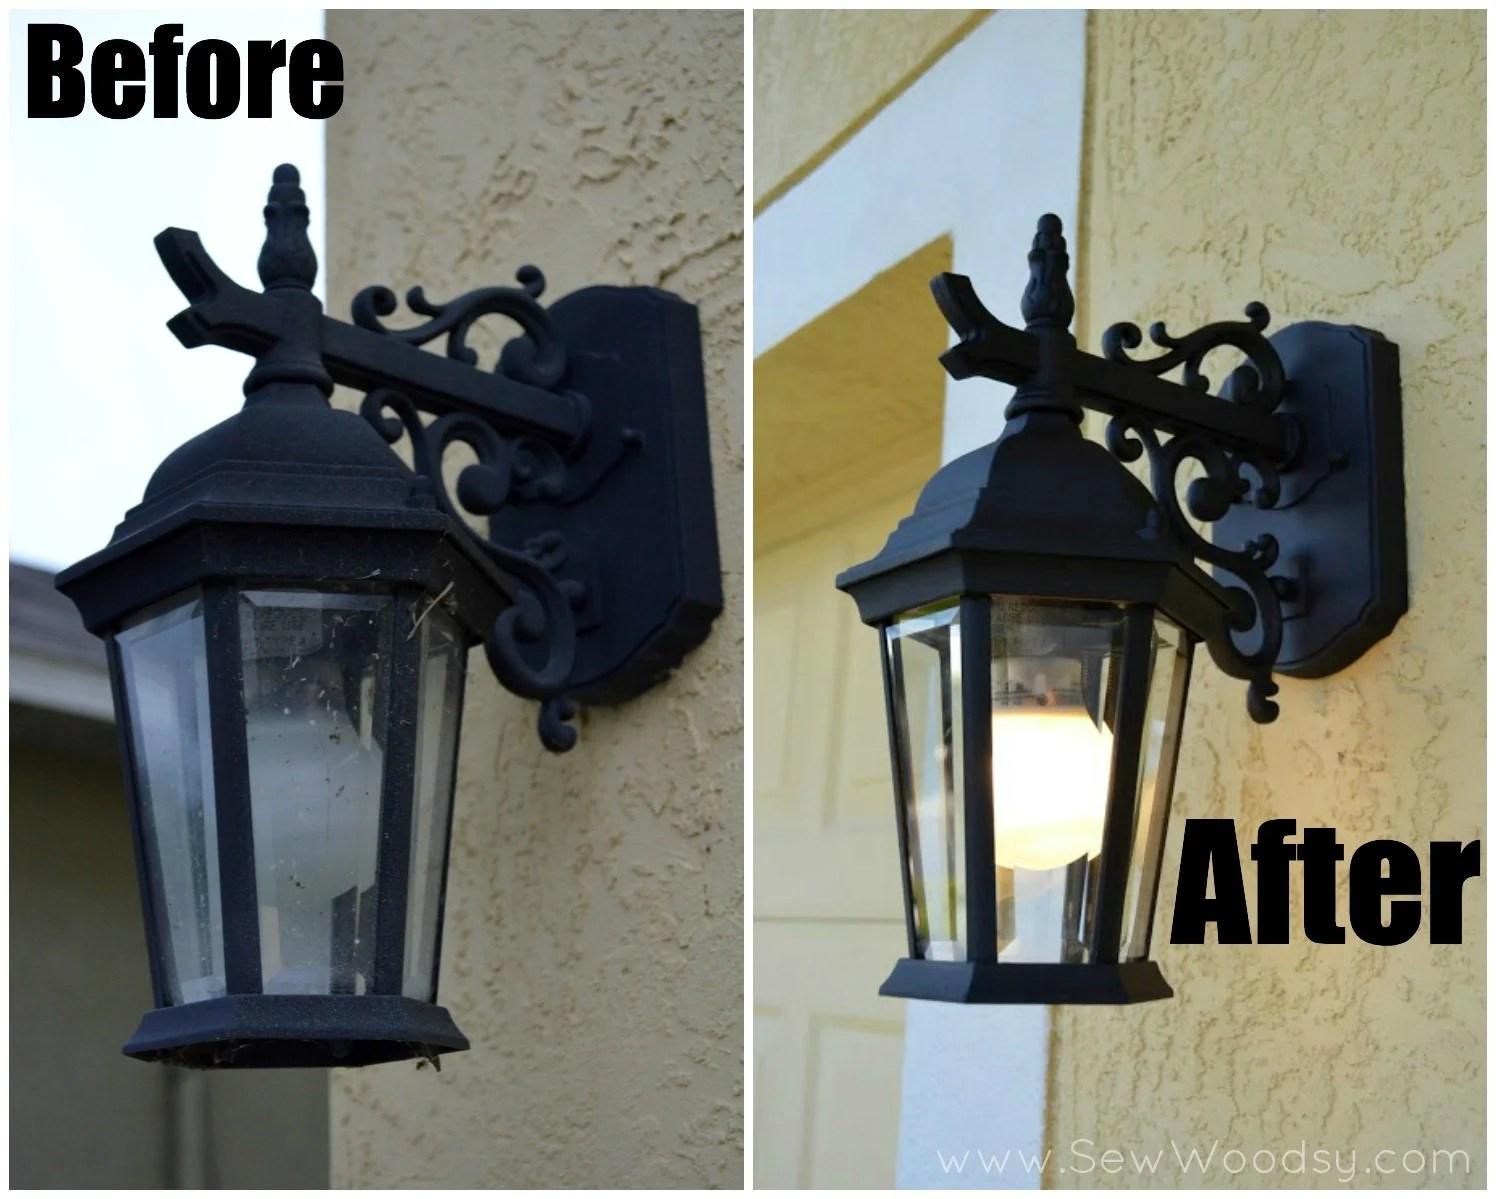 Before and After Spring Lighting Video for Homes.com via SewWoodsy.com